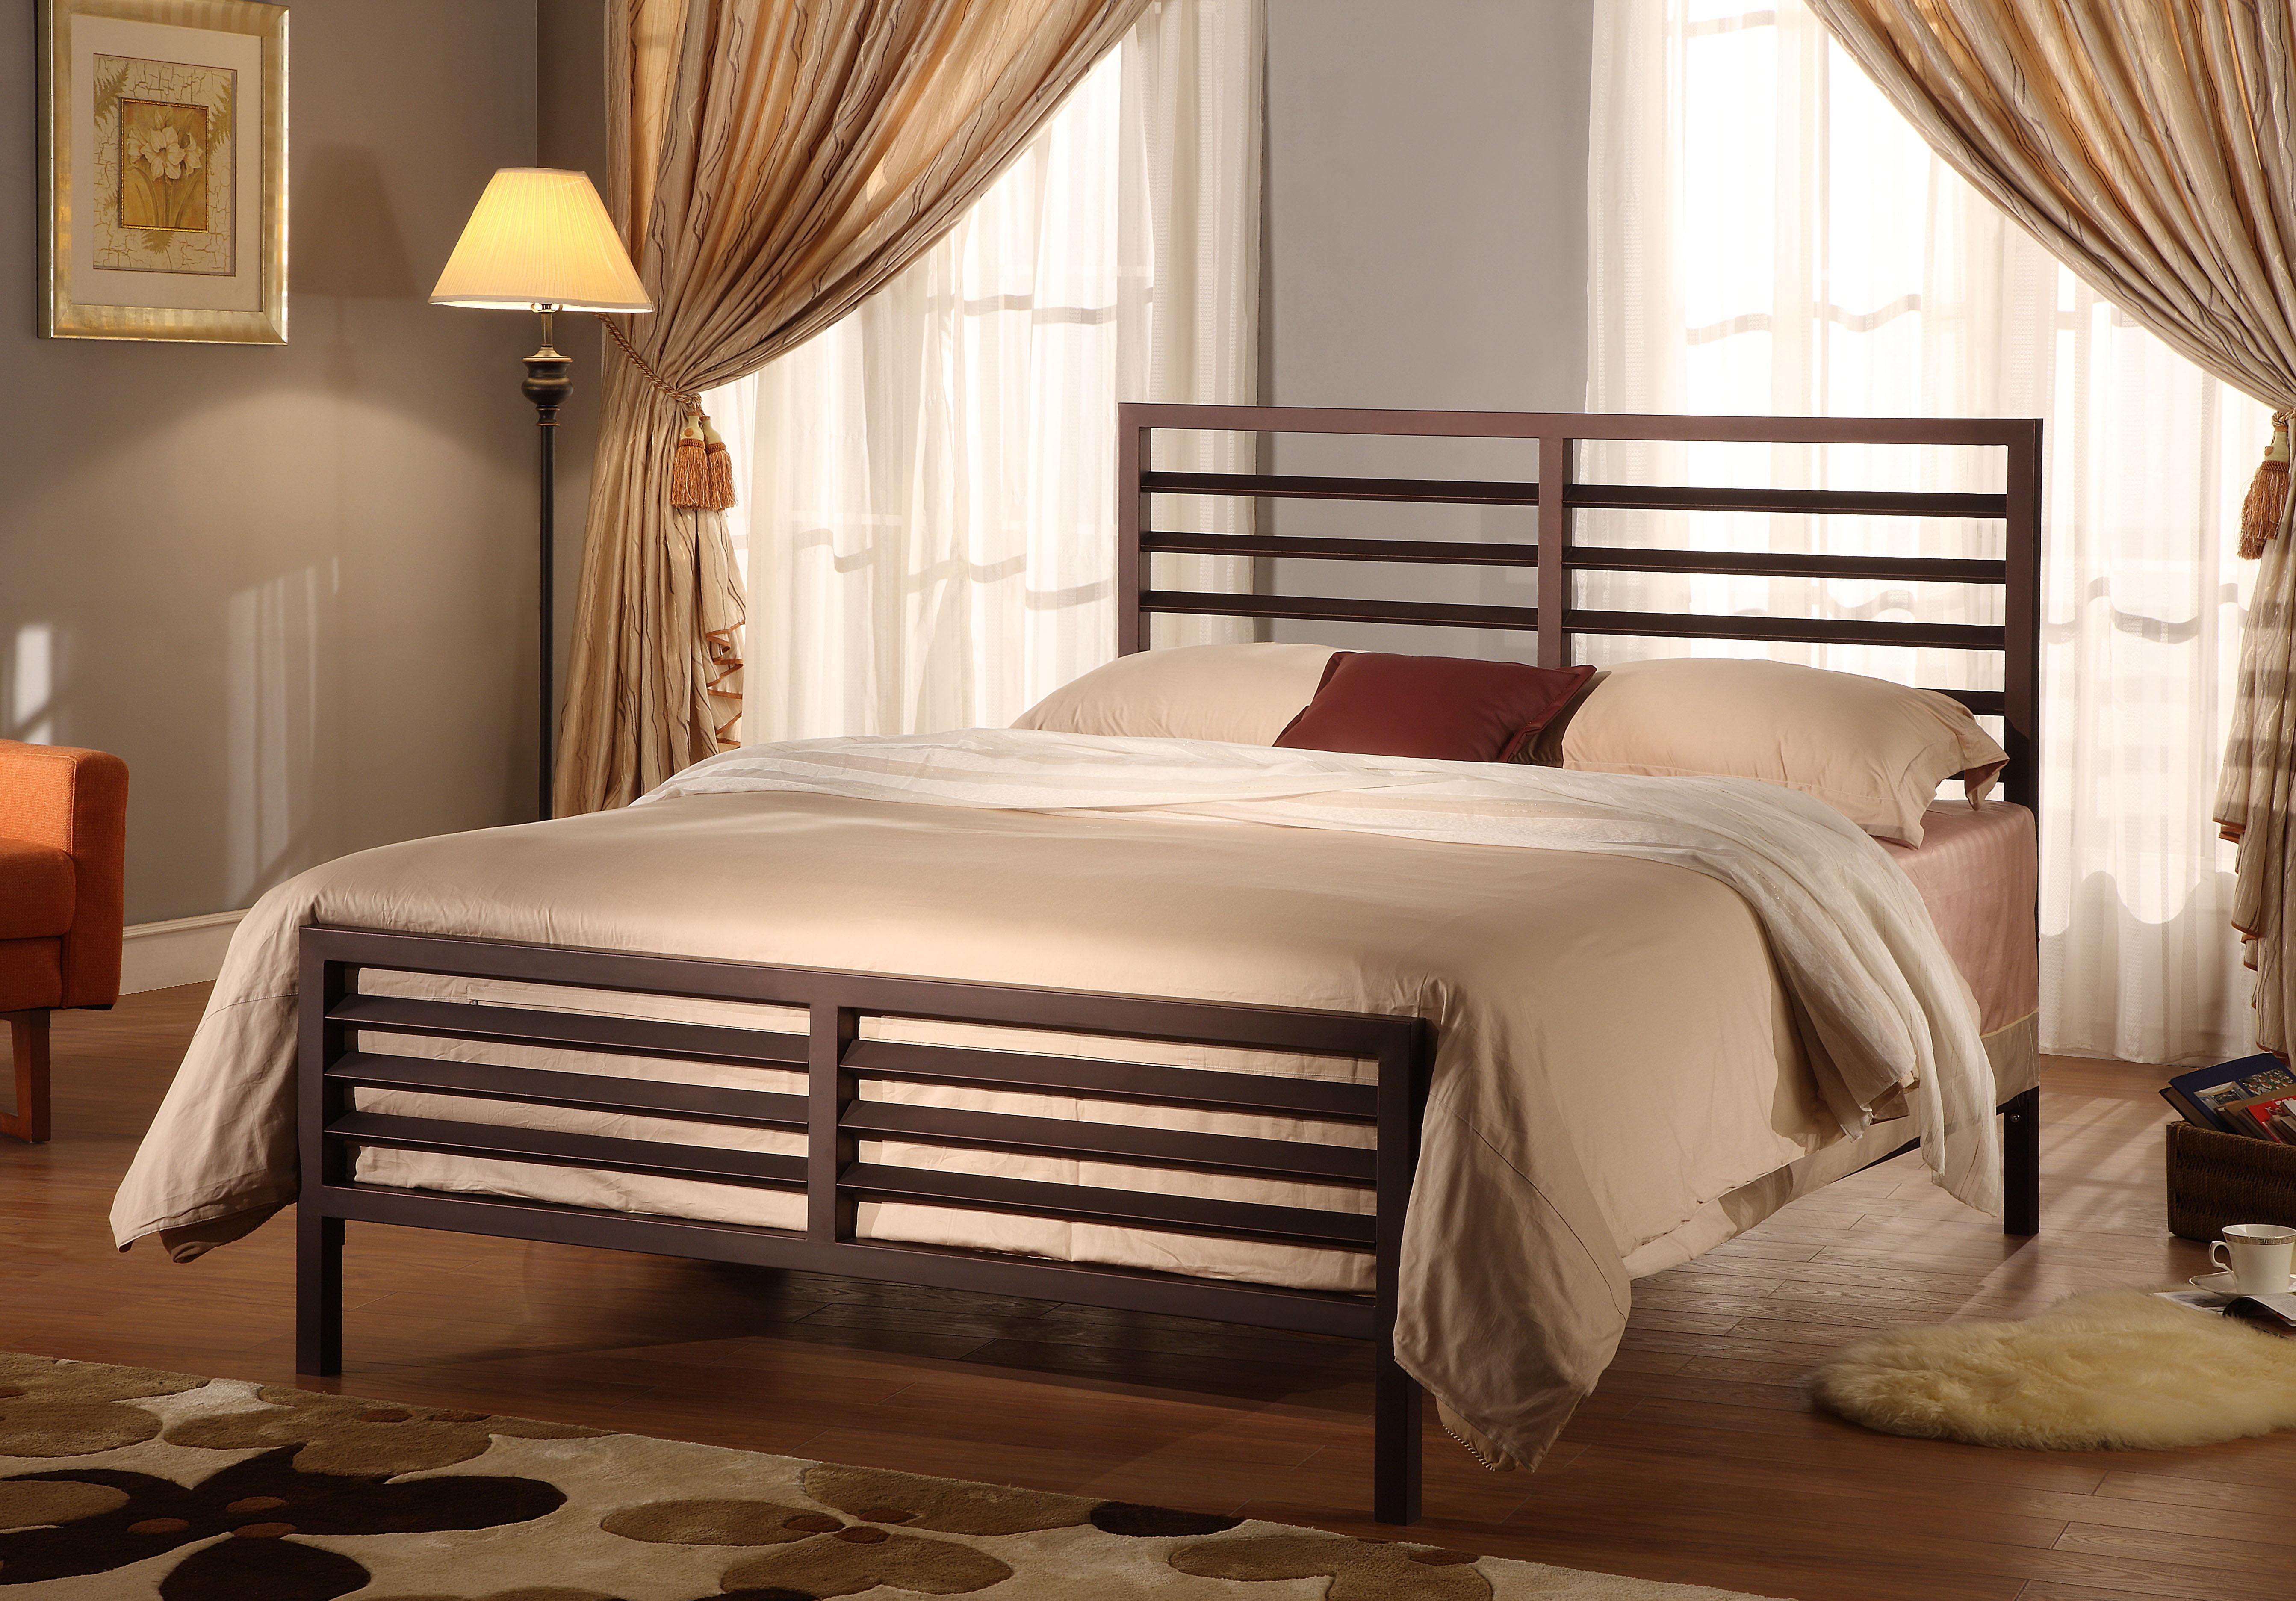 Oakland Full Size Bronze Modern Metal Slat Bed Frame (Headboard Footboard Rails & Slats) by Pilaster Designs